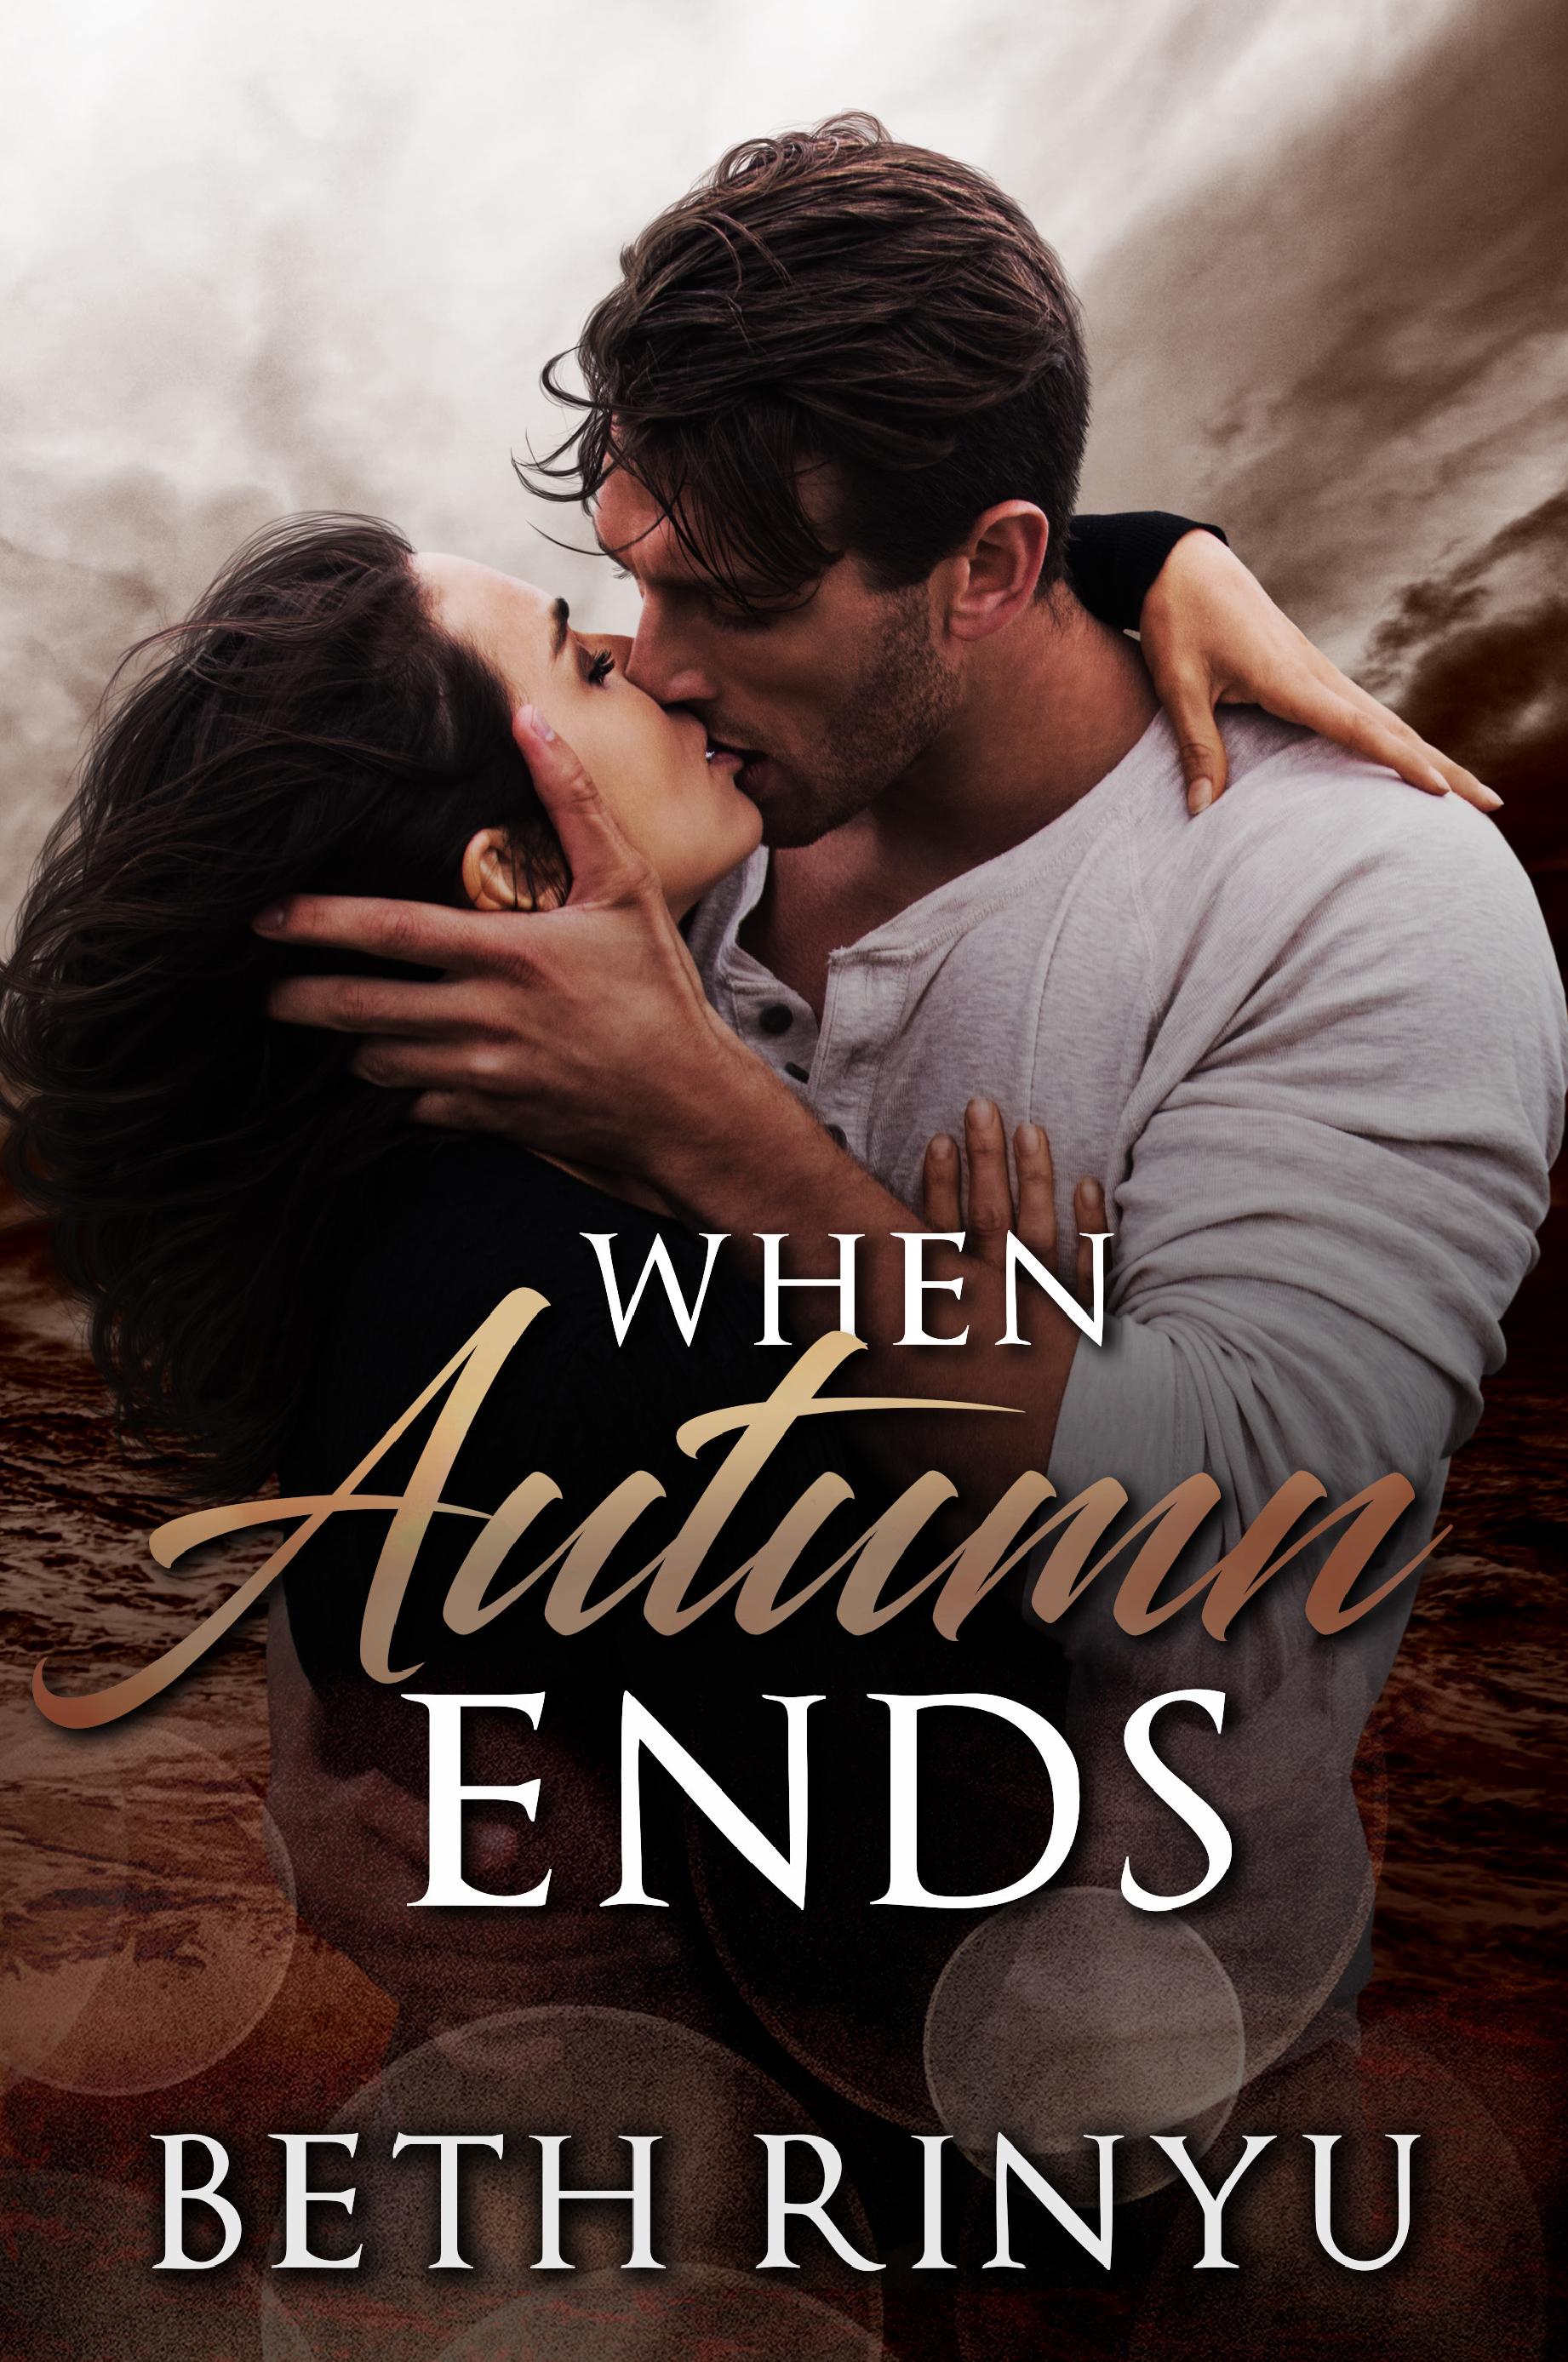 Rinyu, Beth - When Autumn Ends